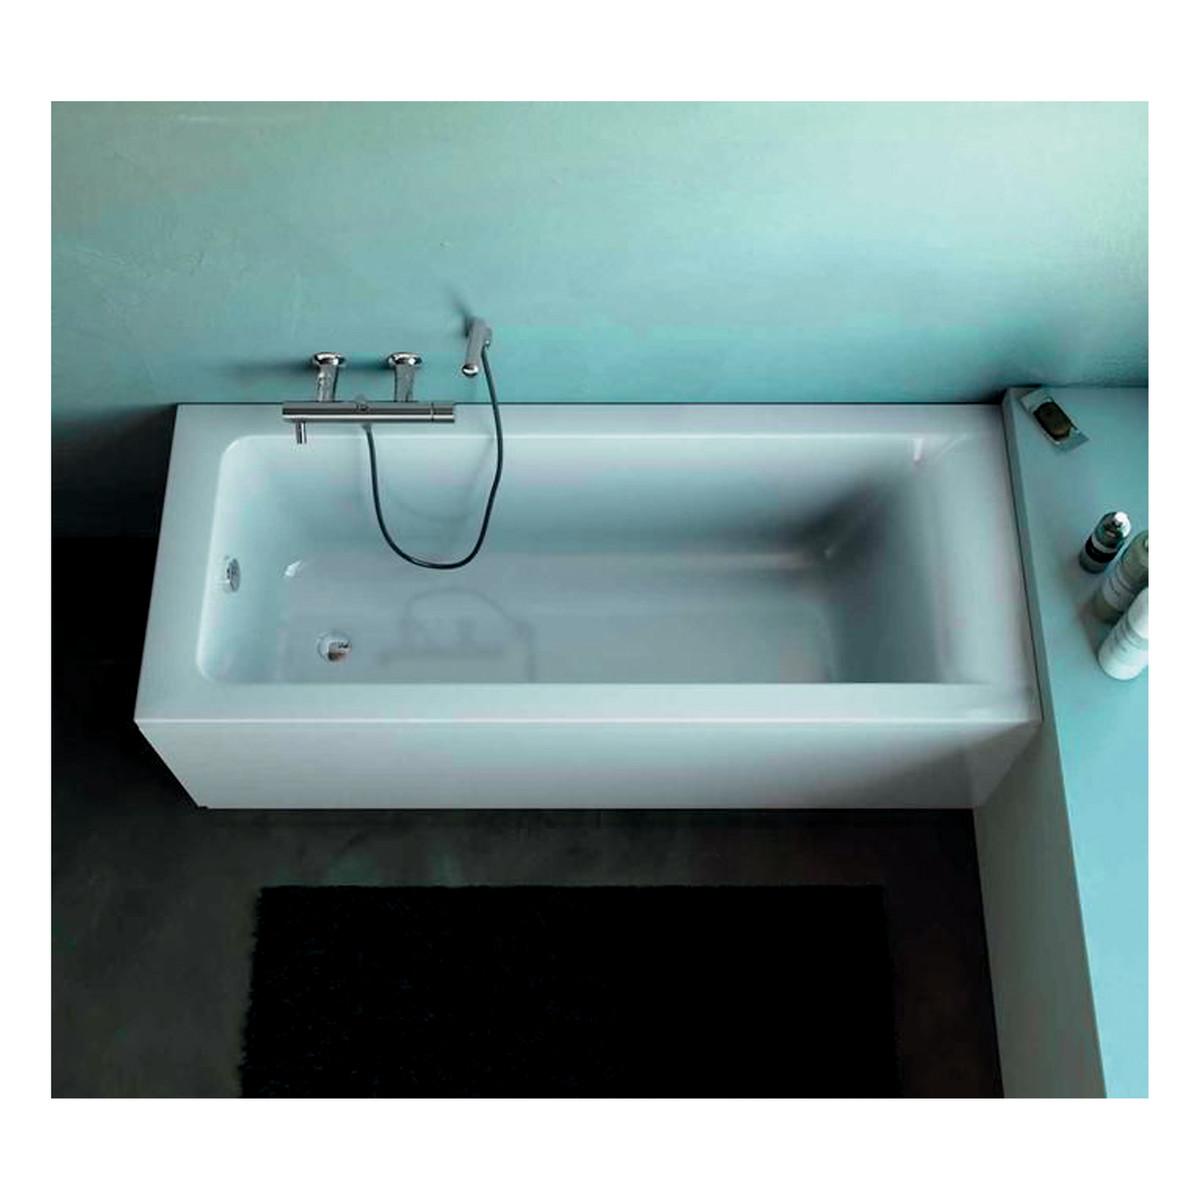 Ideal standard vasca idromassaggio tonda aqualia prezzo for Parete vasca pieghevole leroy merlin